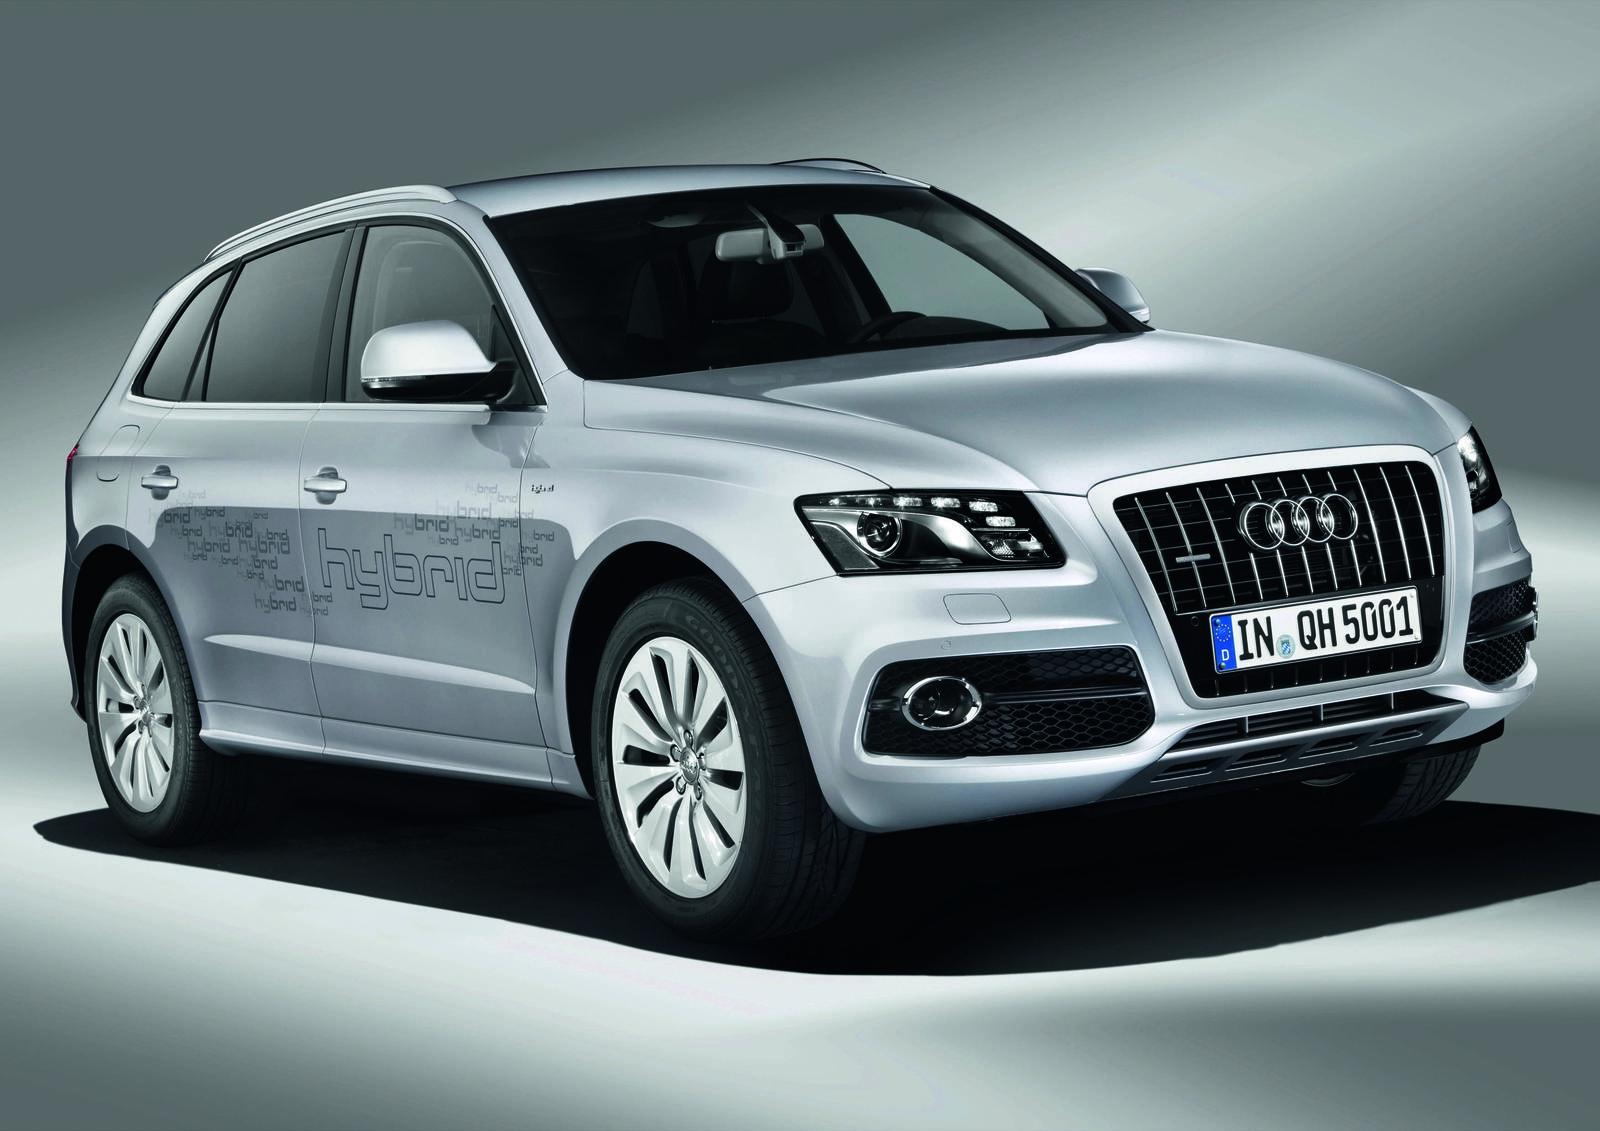 2011 audi q5 hybrid quattro details spec new car used car reviews picture. Black Bedroom Furniture Sets. Home Design Ideas